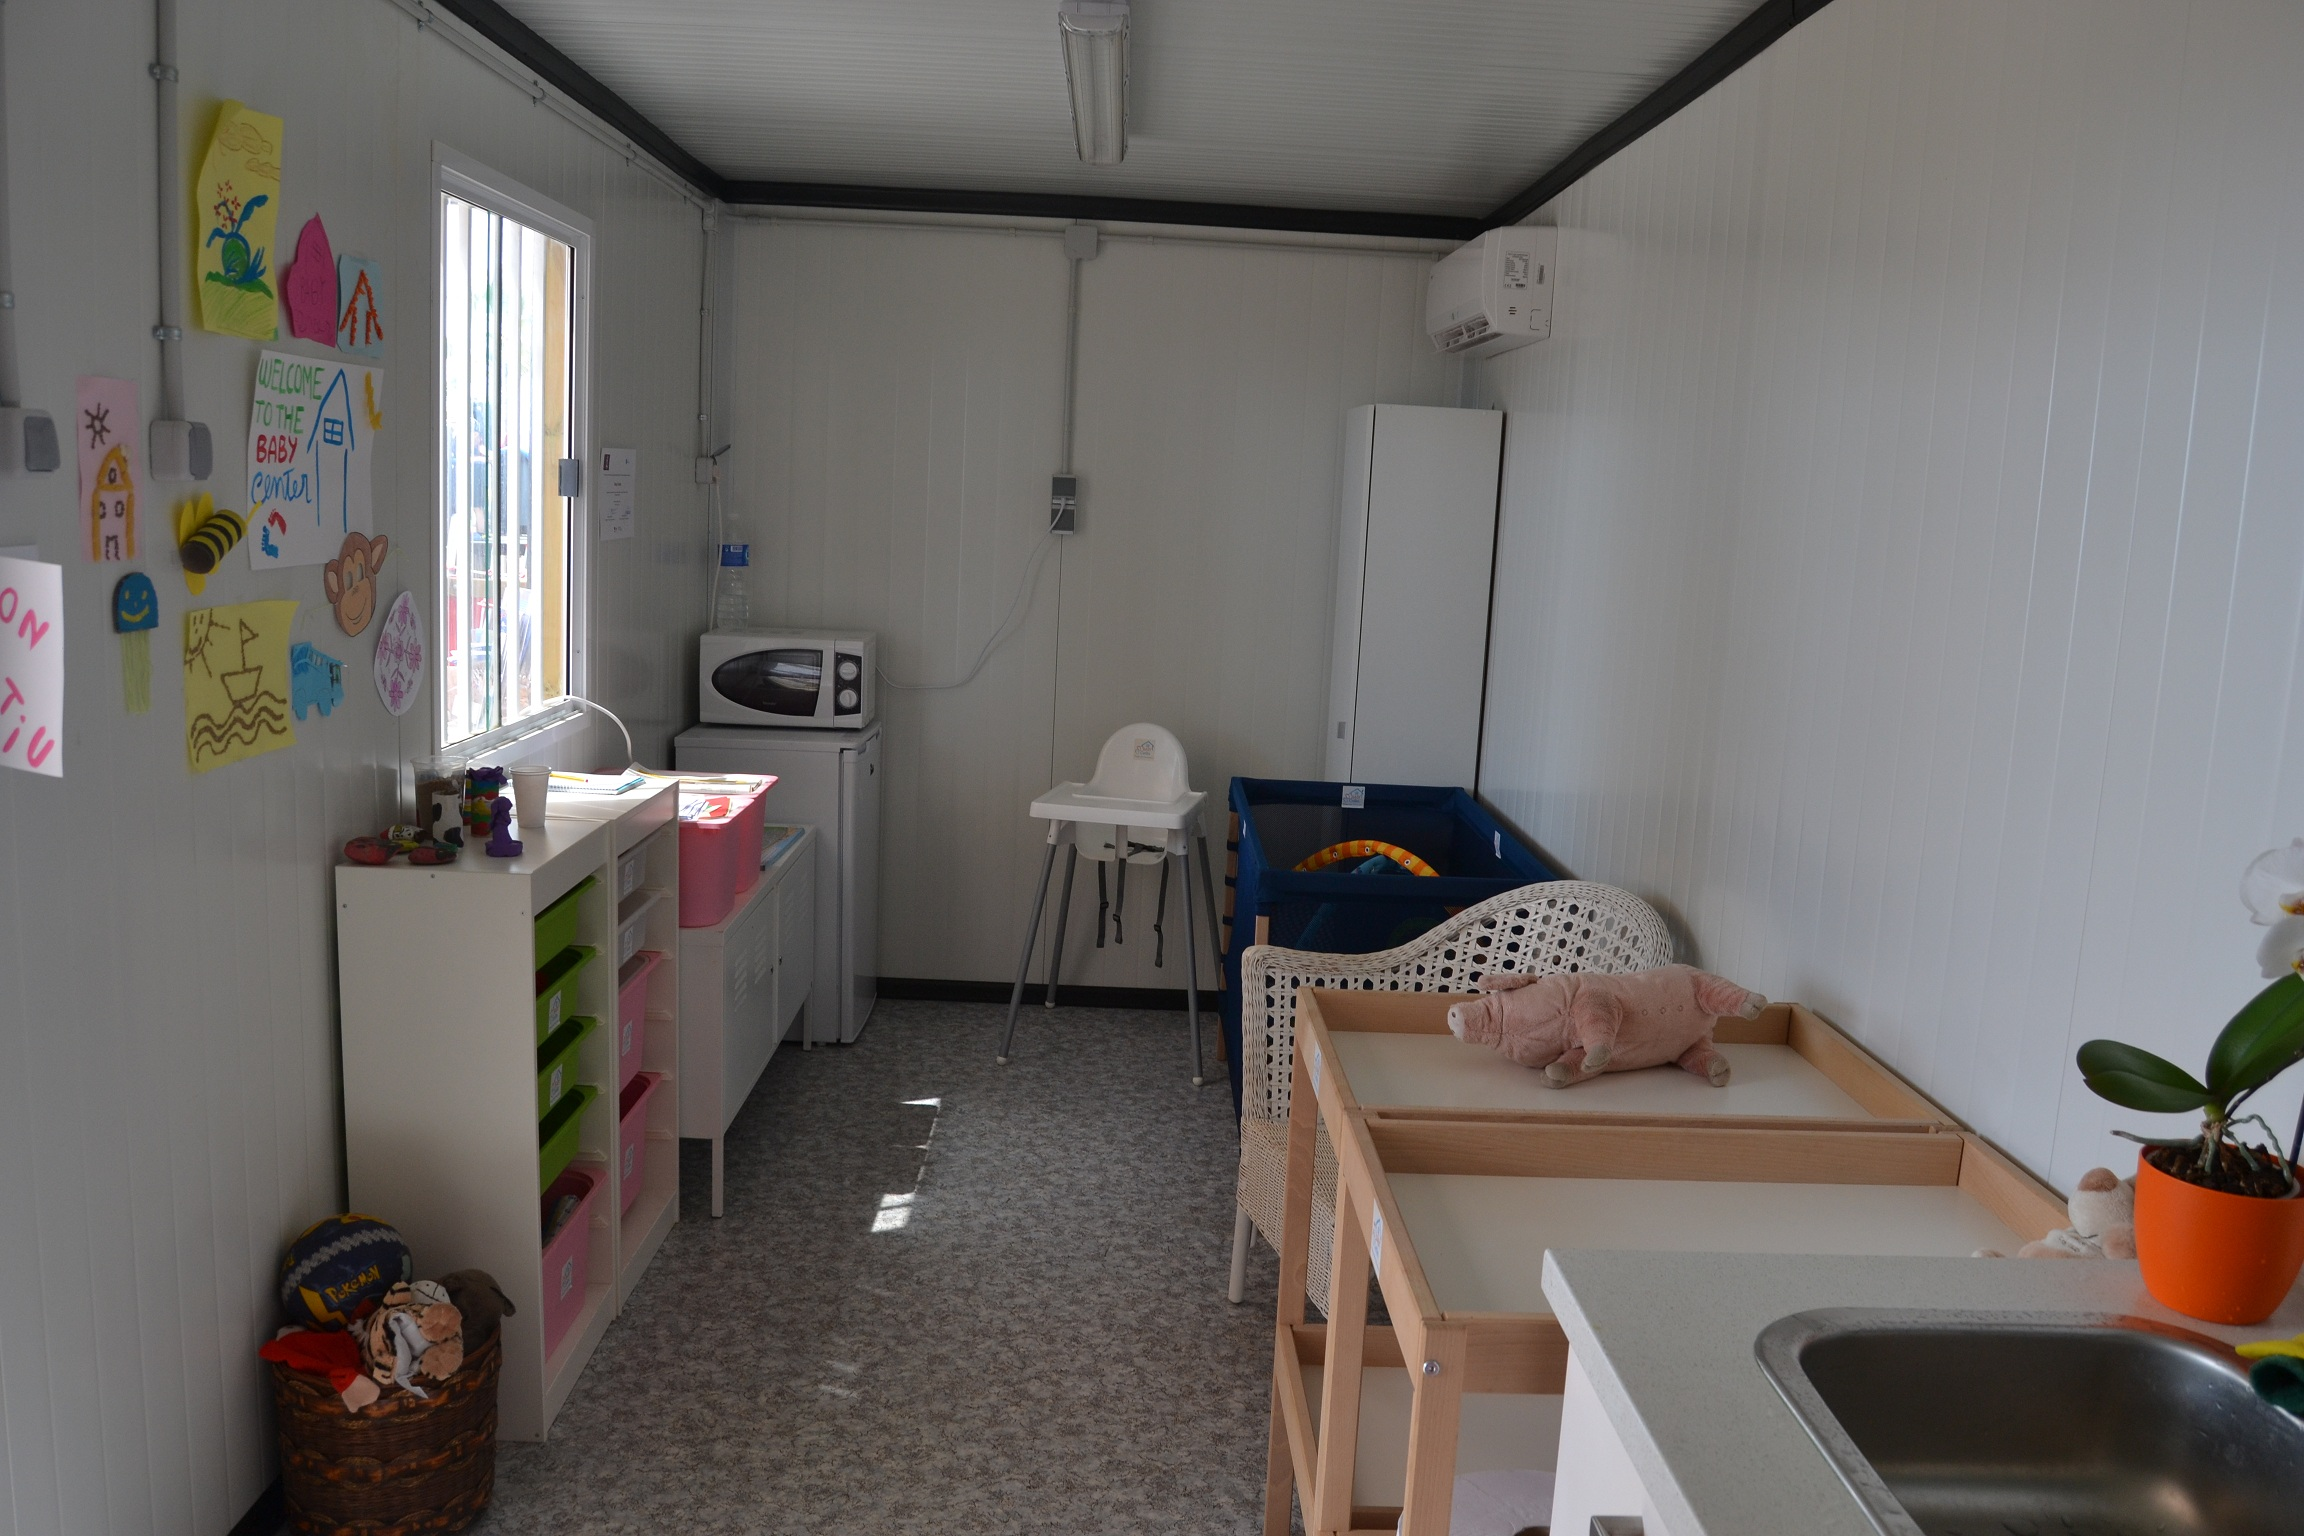 Baby Center de Pineda